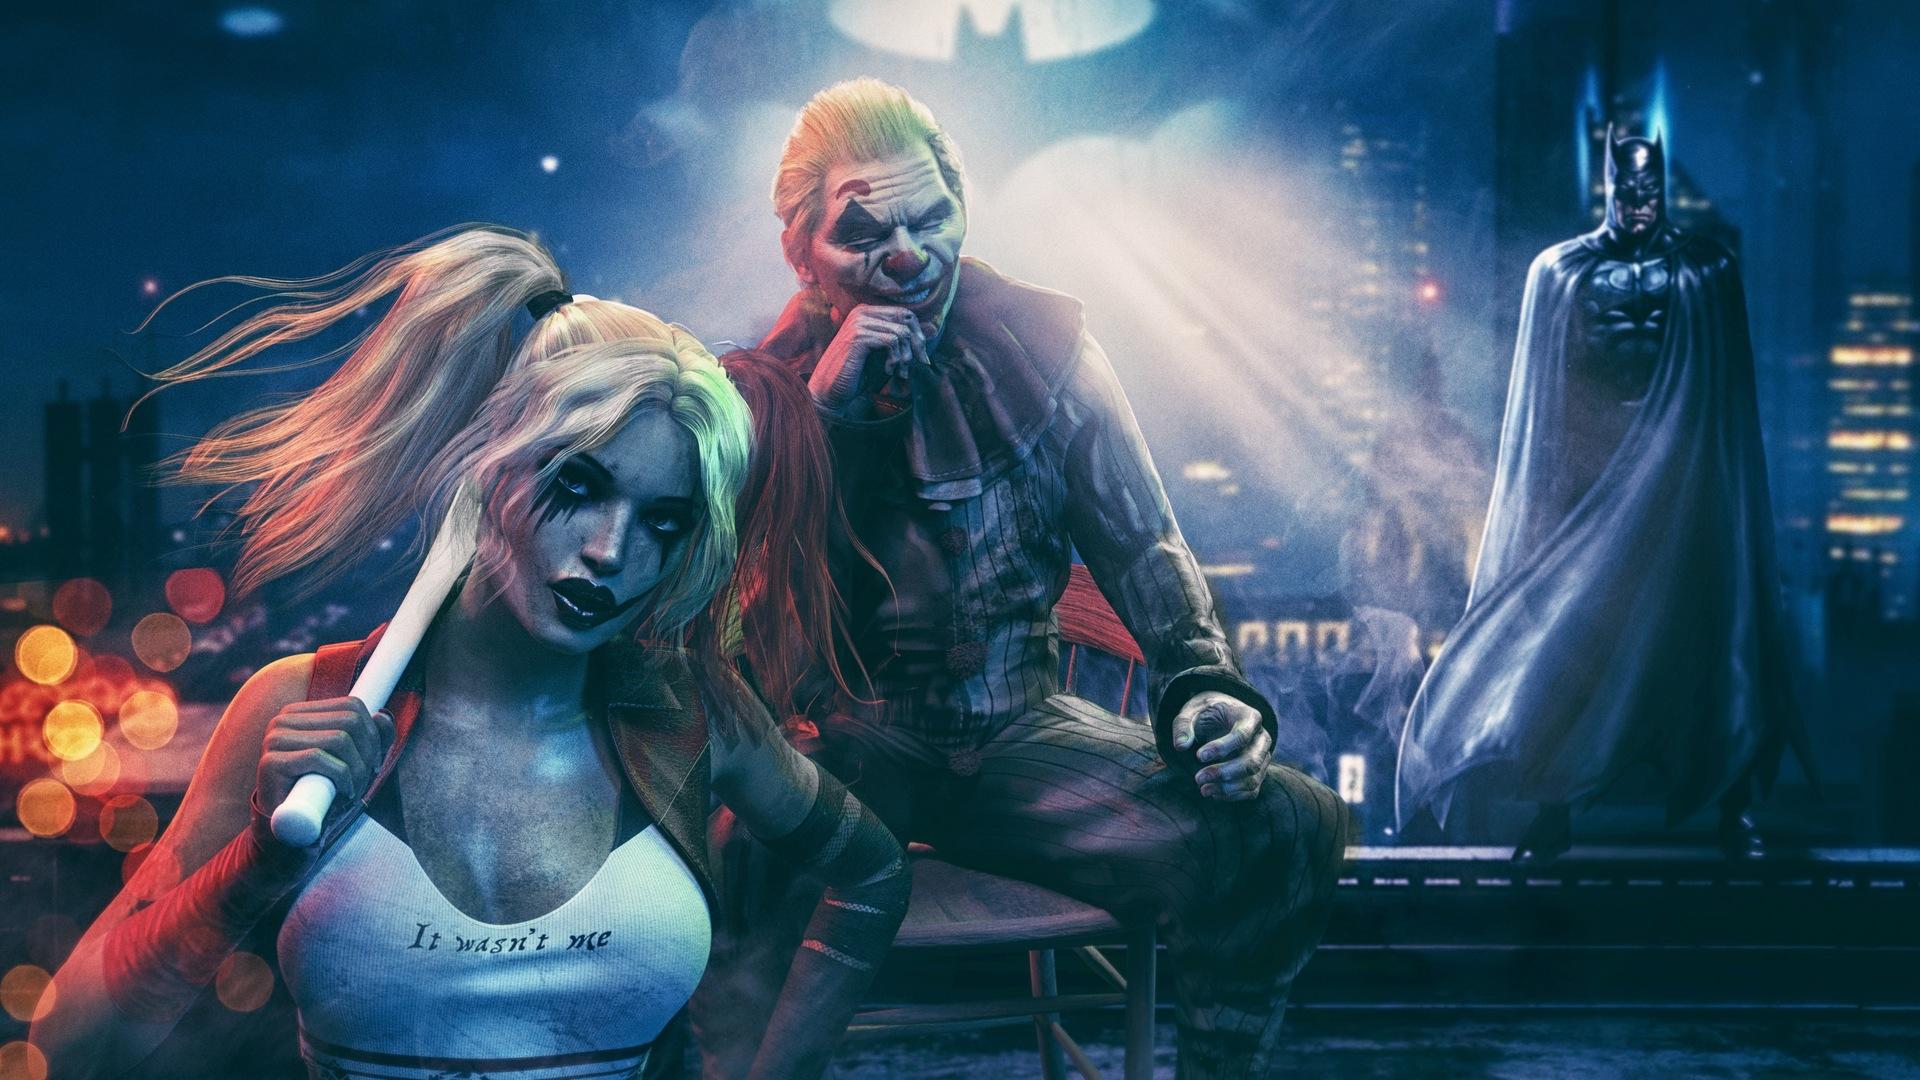 1920x1080 Joker With Harley Quinn And Batman Laptop Full ...